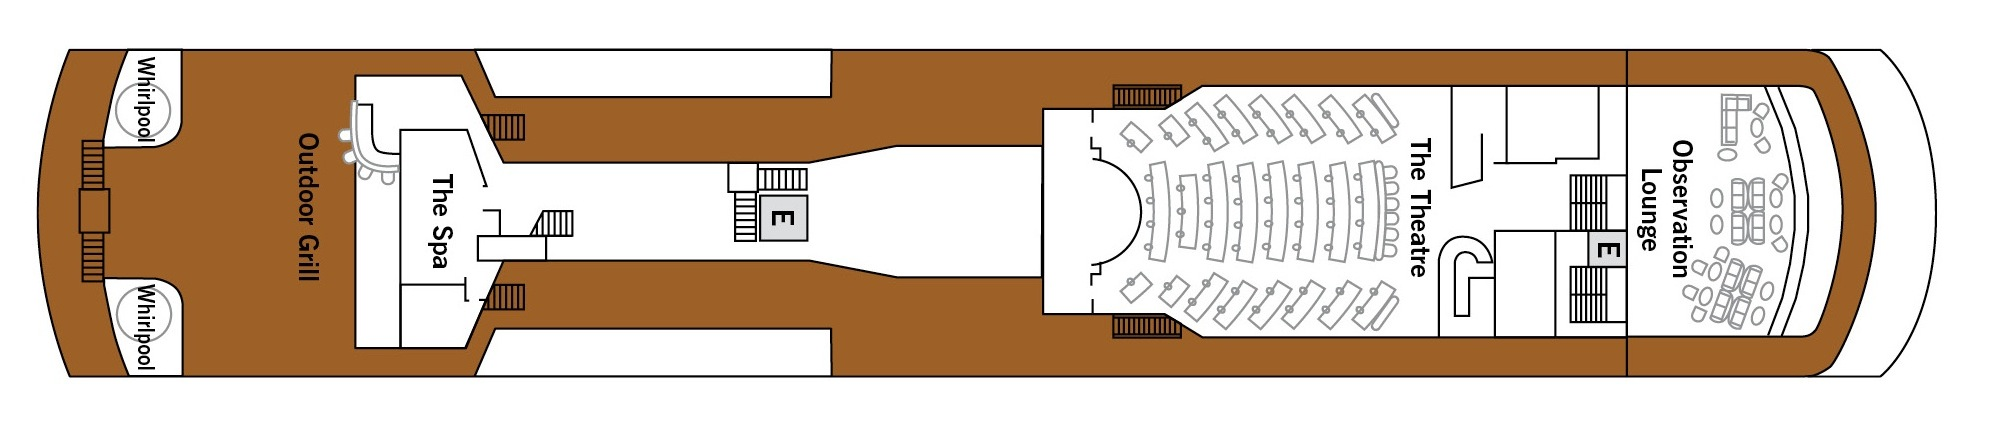 Silversea Cruises Silver Explorer Deck Plans Deck 6.jpg